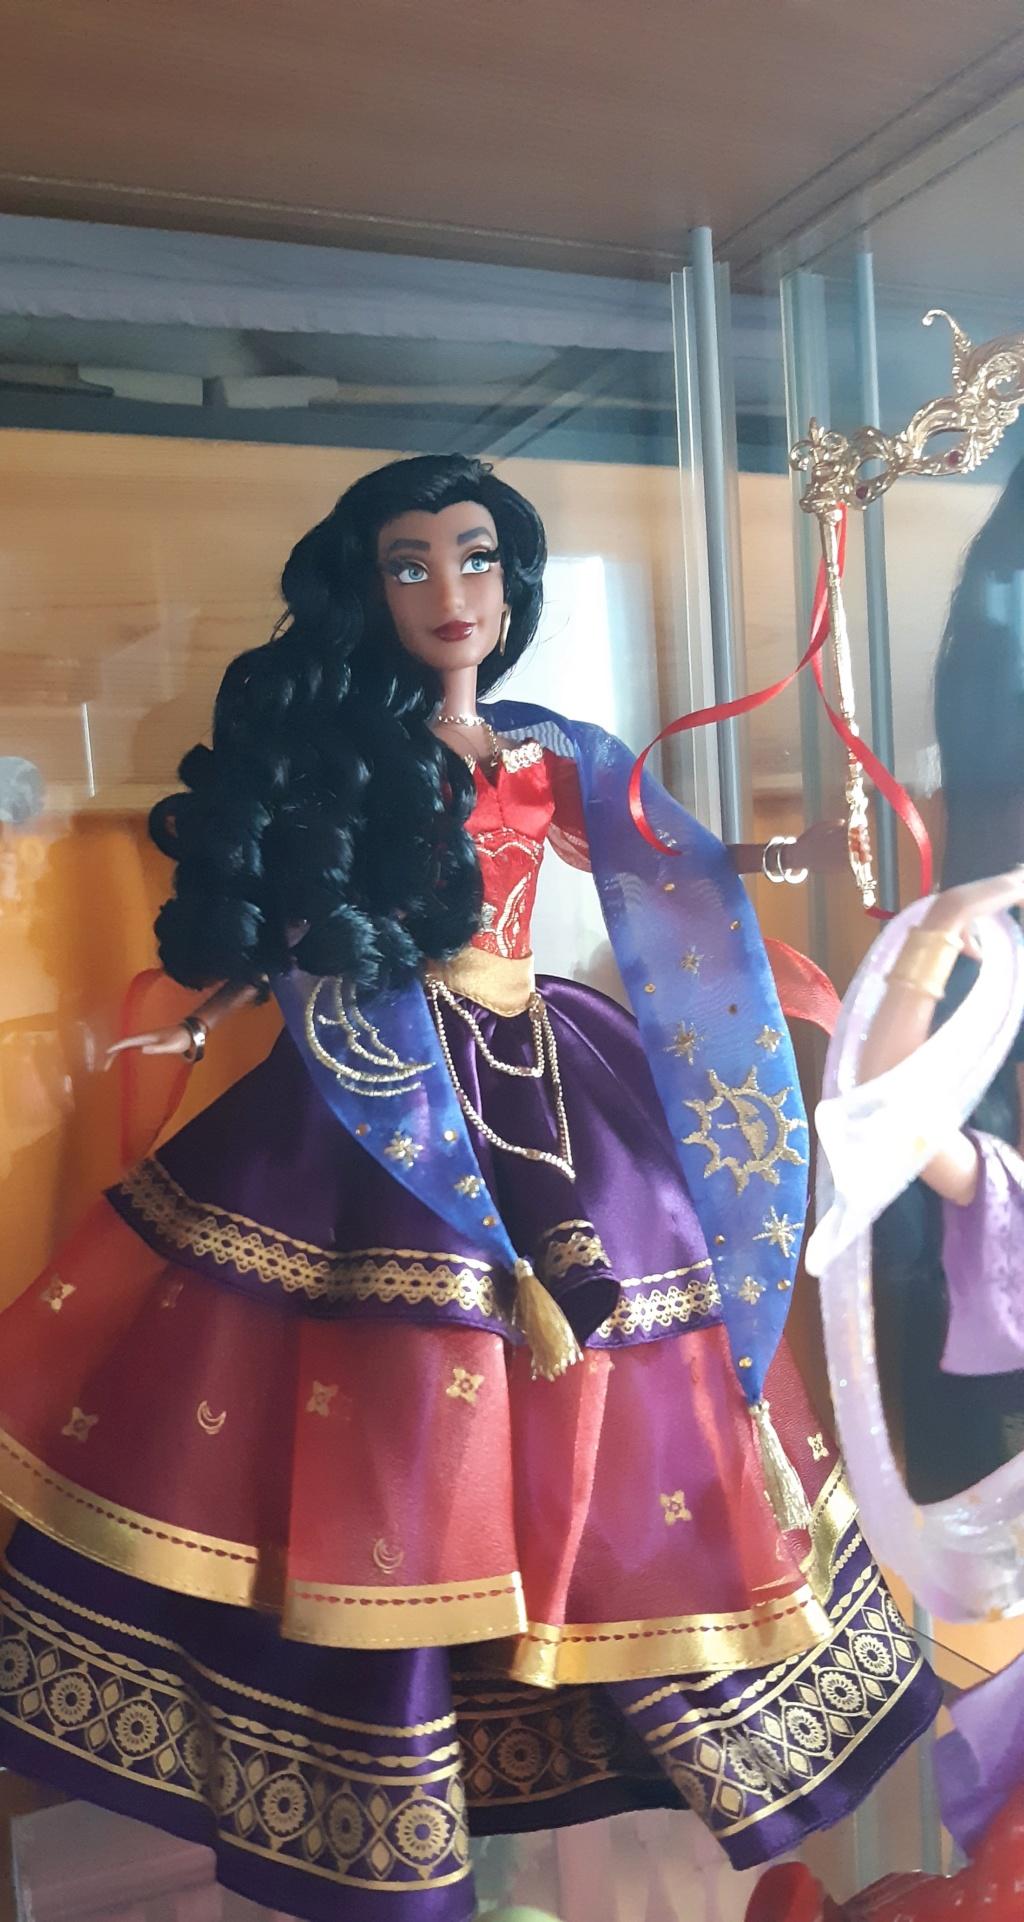 Disney Midnight Masquerade Designer Collection (depuis 2019) - Page 23 20191044